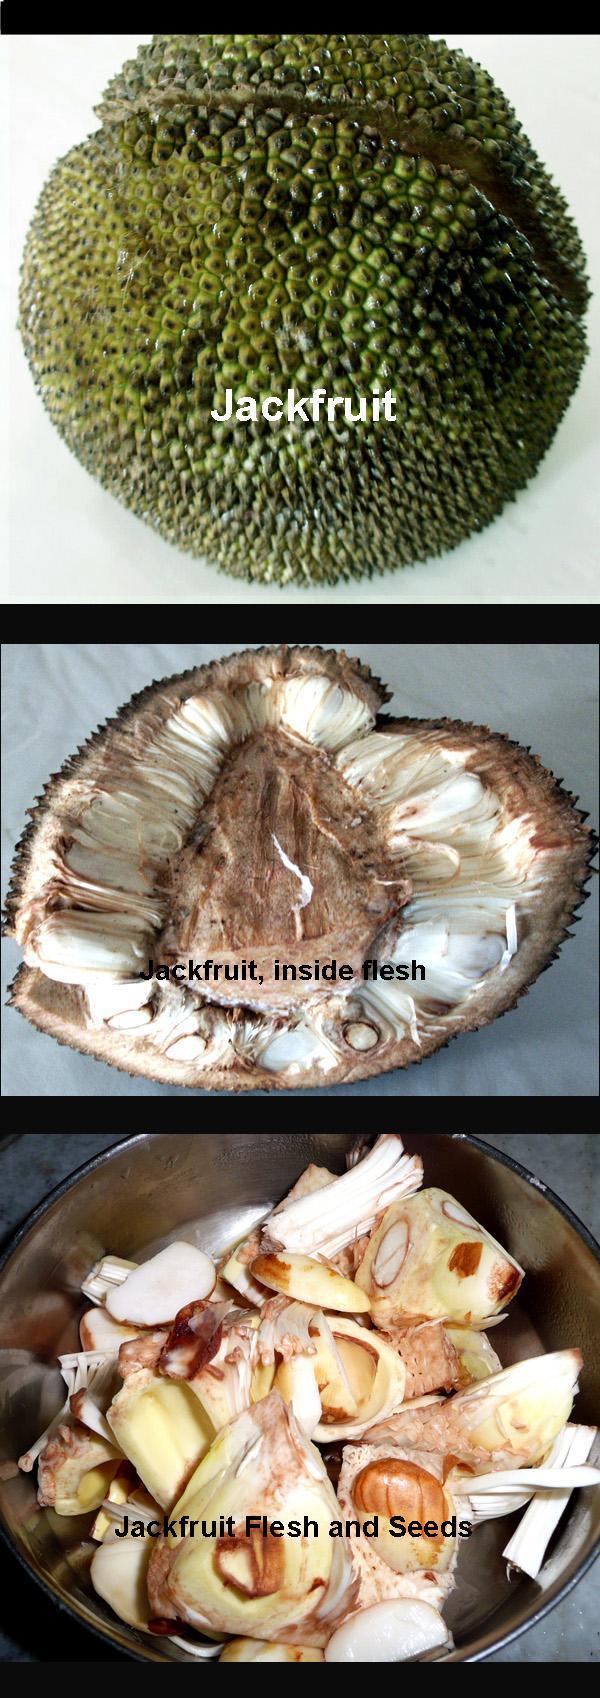 Jackfruit Pickle